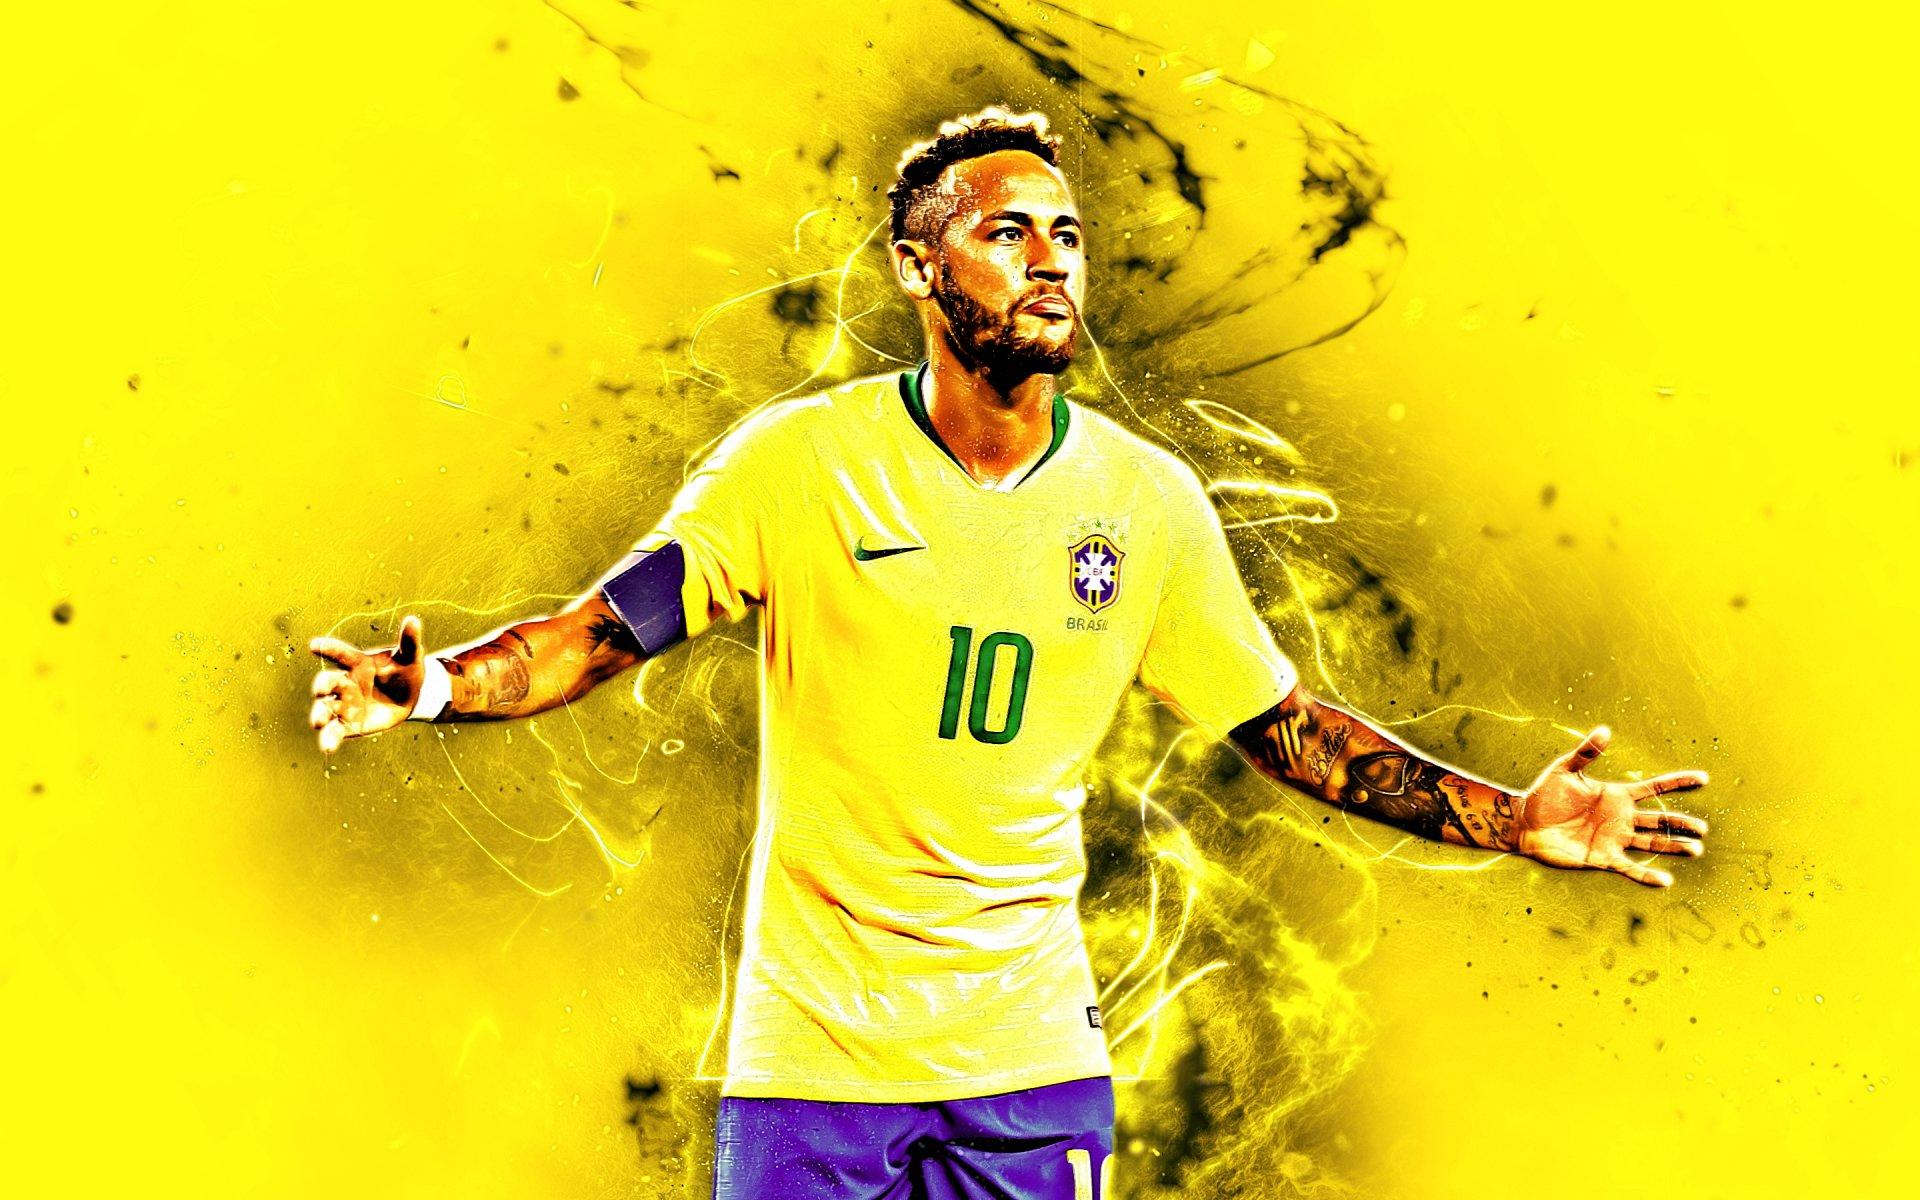 Cool Wallpapers Brazil Football: Neymar Jr - Brazil HD Wallpaper